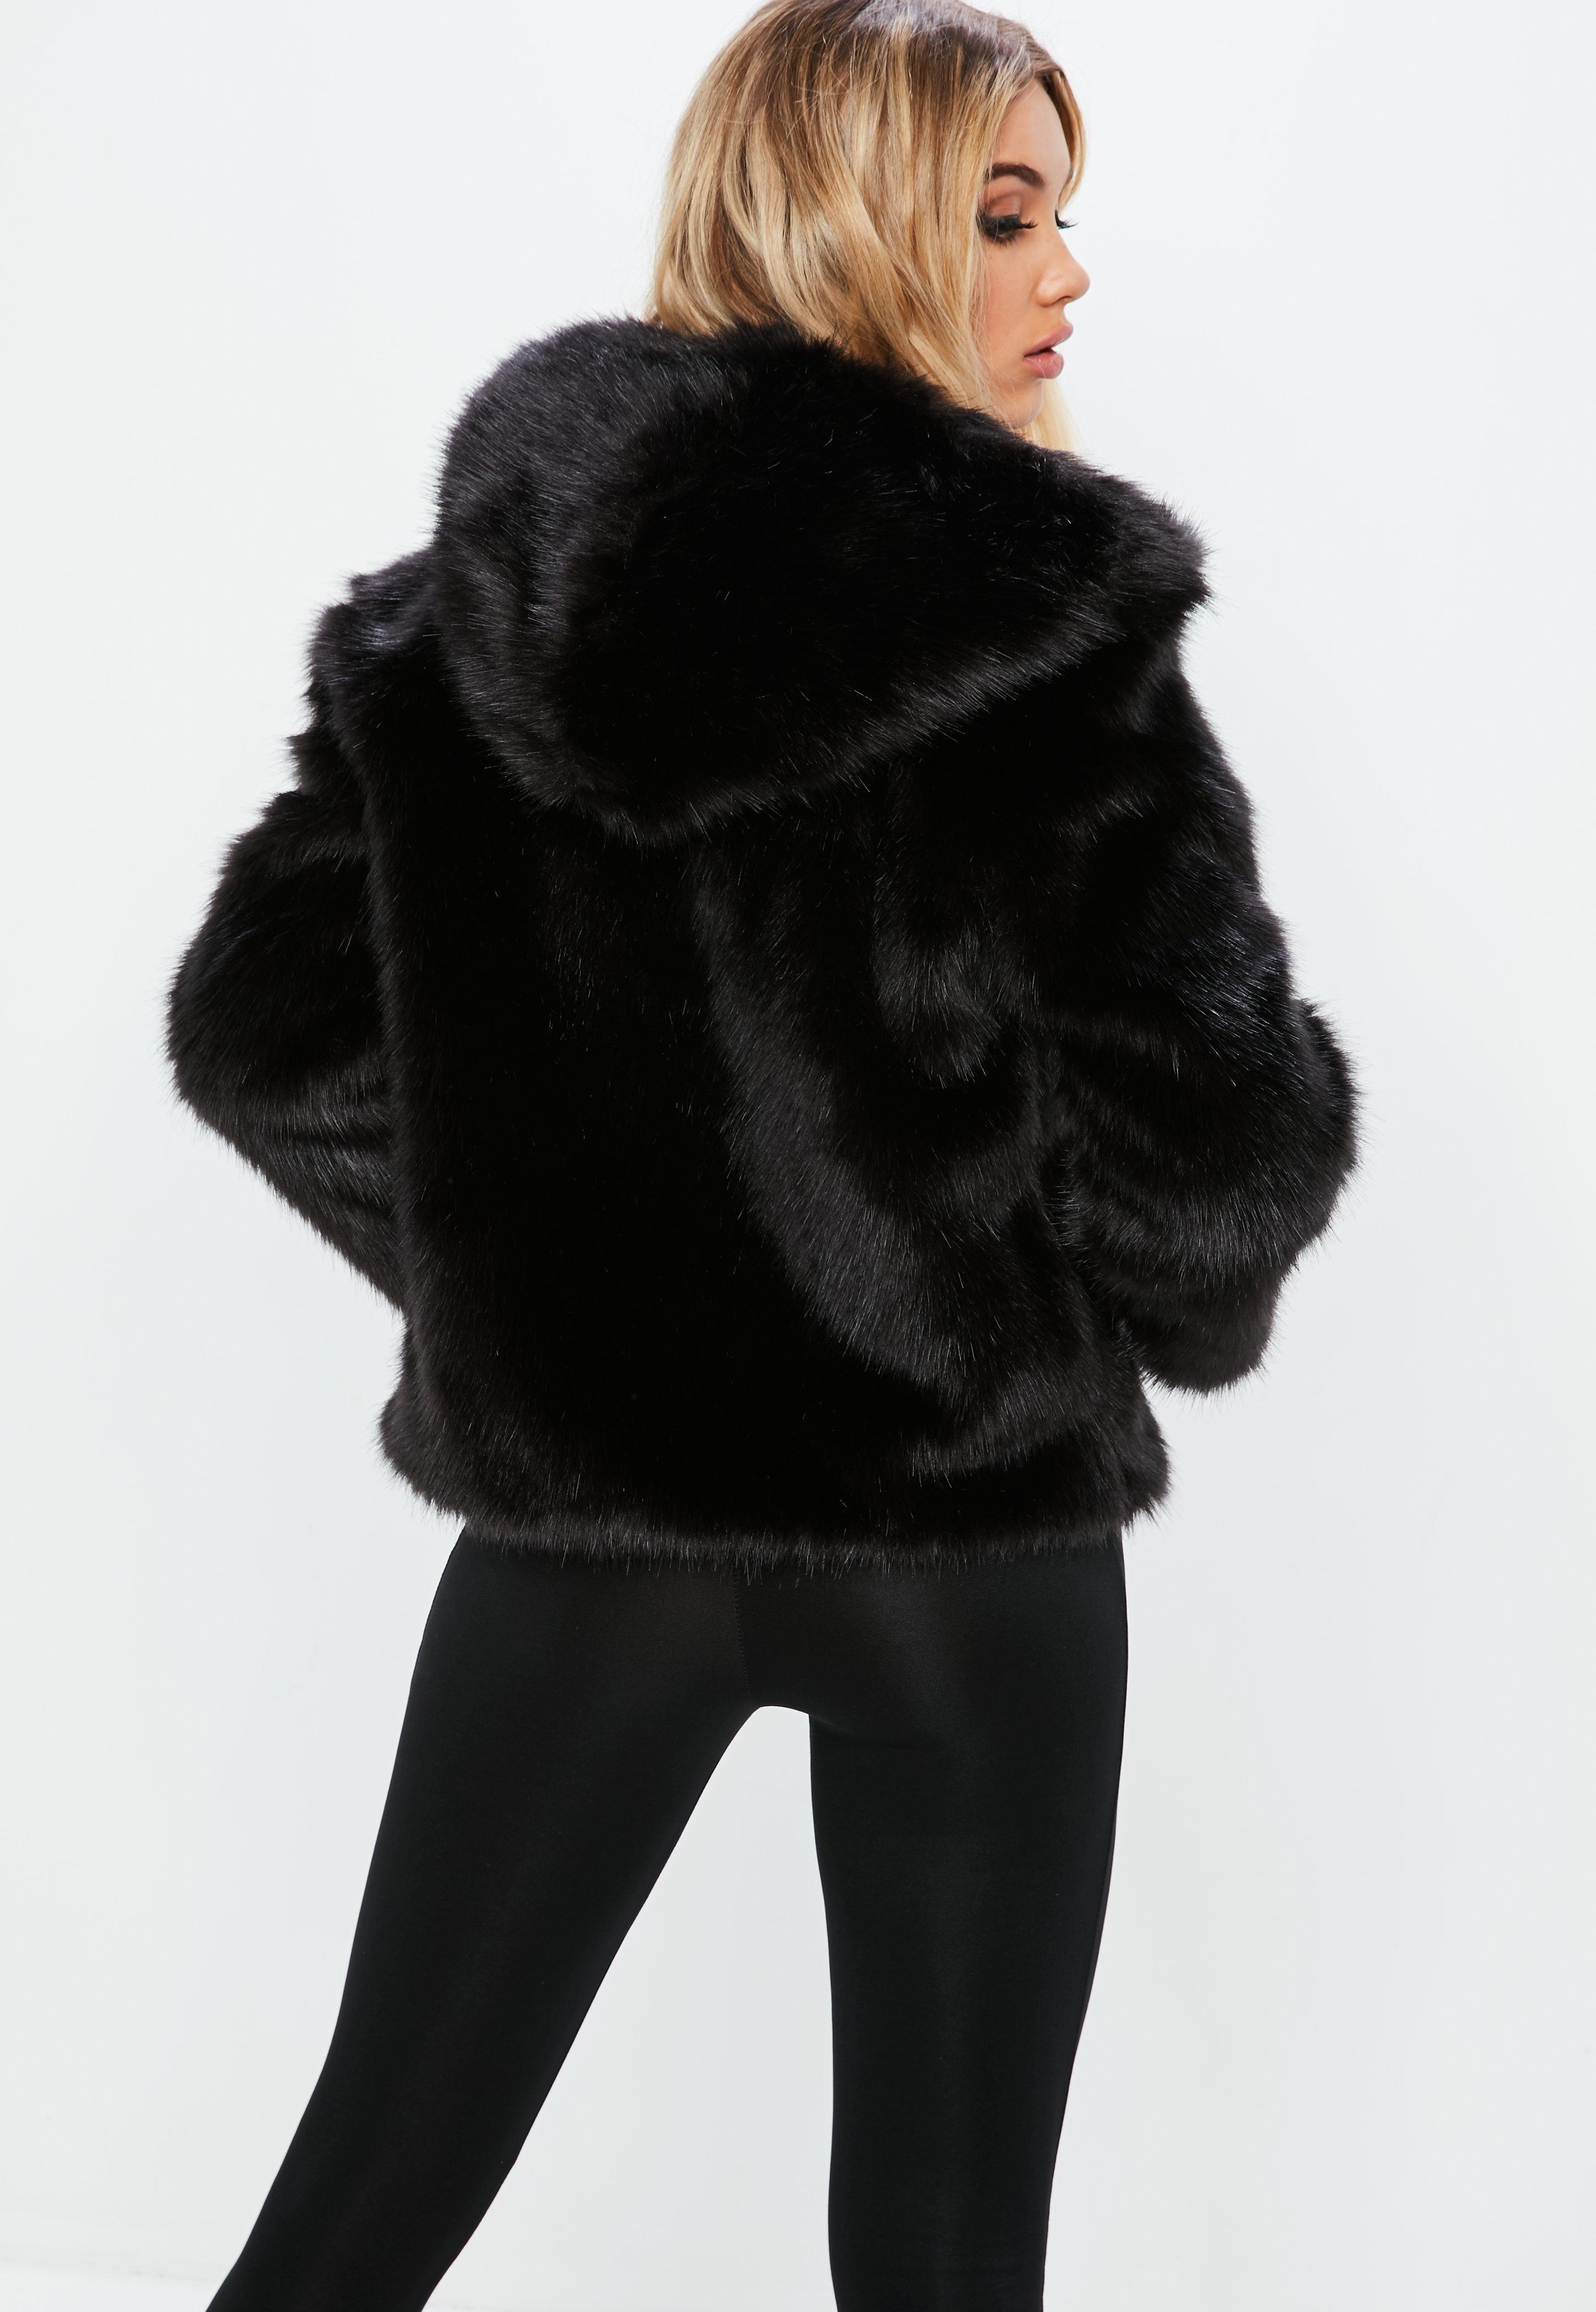 8e5e41fc4 Missguided Fanny Lyckman X Black Hooded Faux Fur Jacket in Black - Lyst